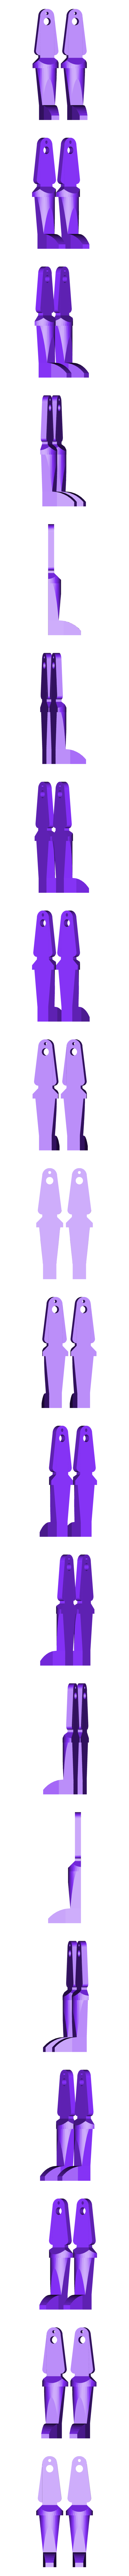 Ornament_Legs.STL Download free STL file Pull-String Nutcracker Ornament • 3D printer template, Girthnath